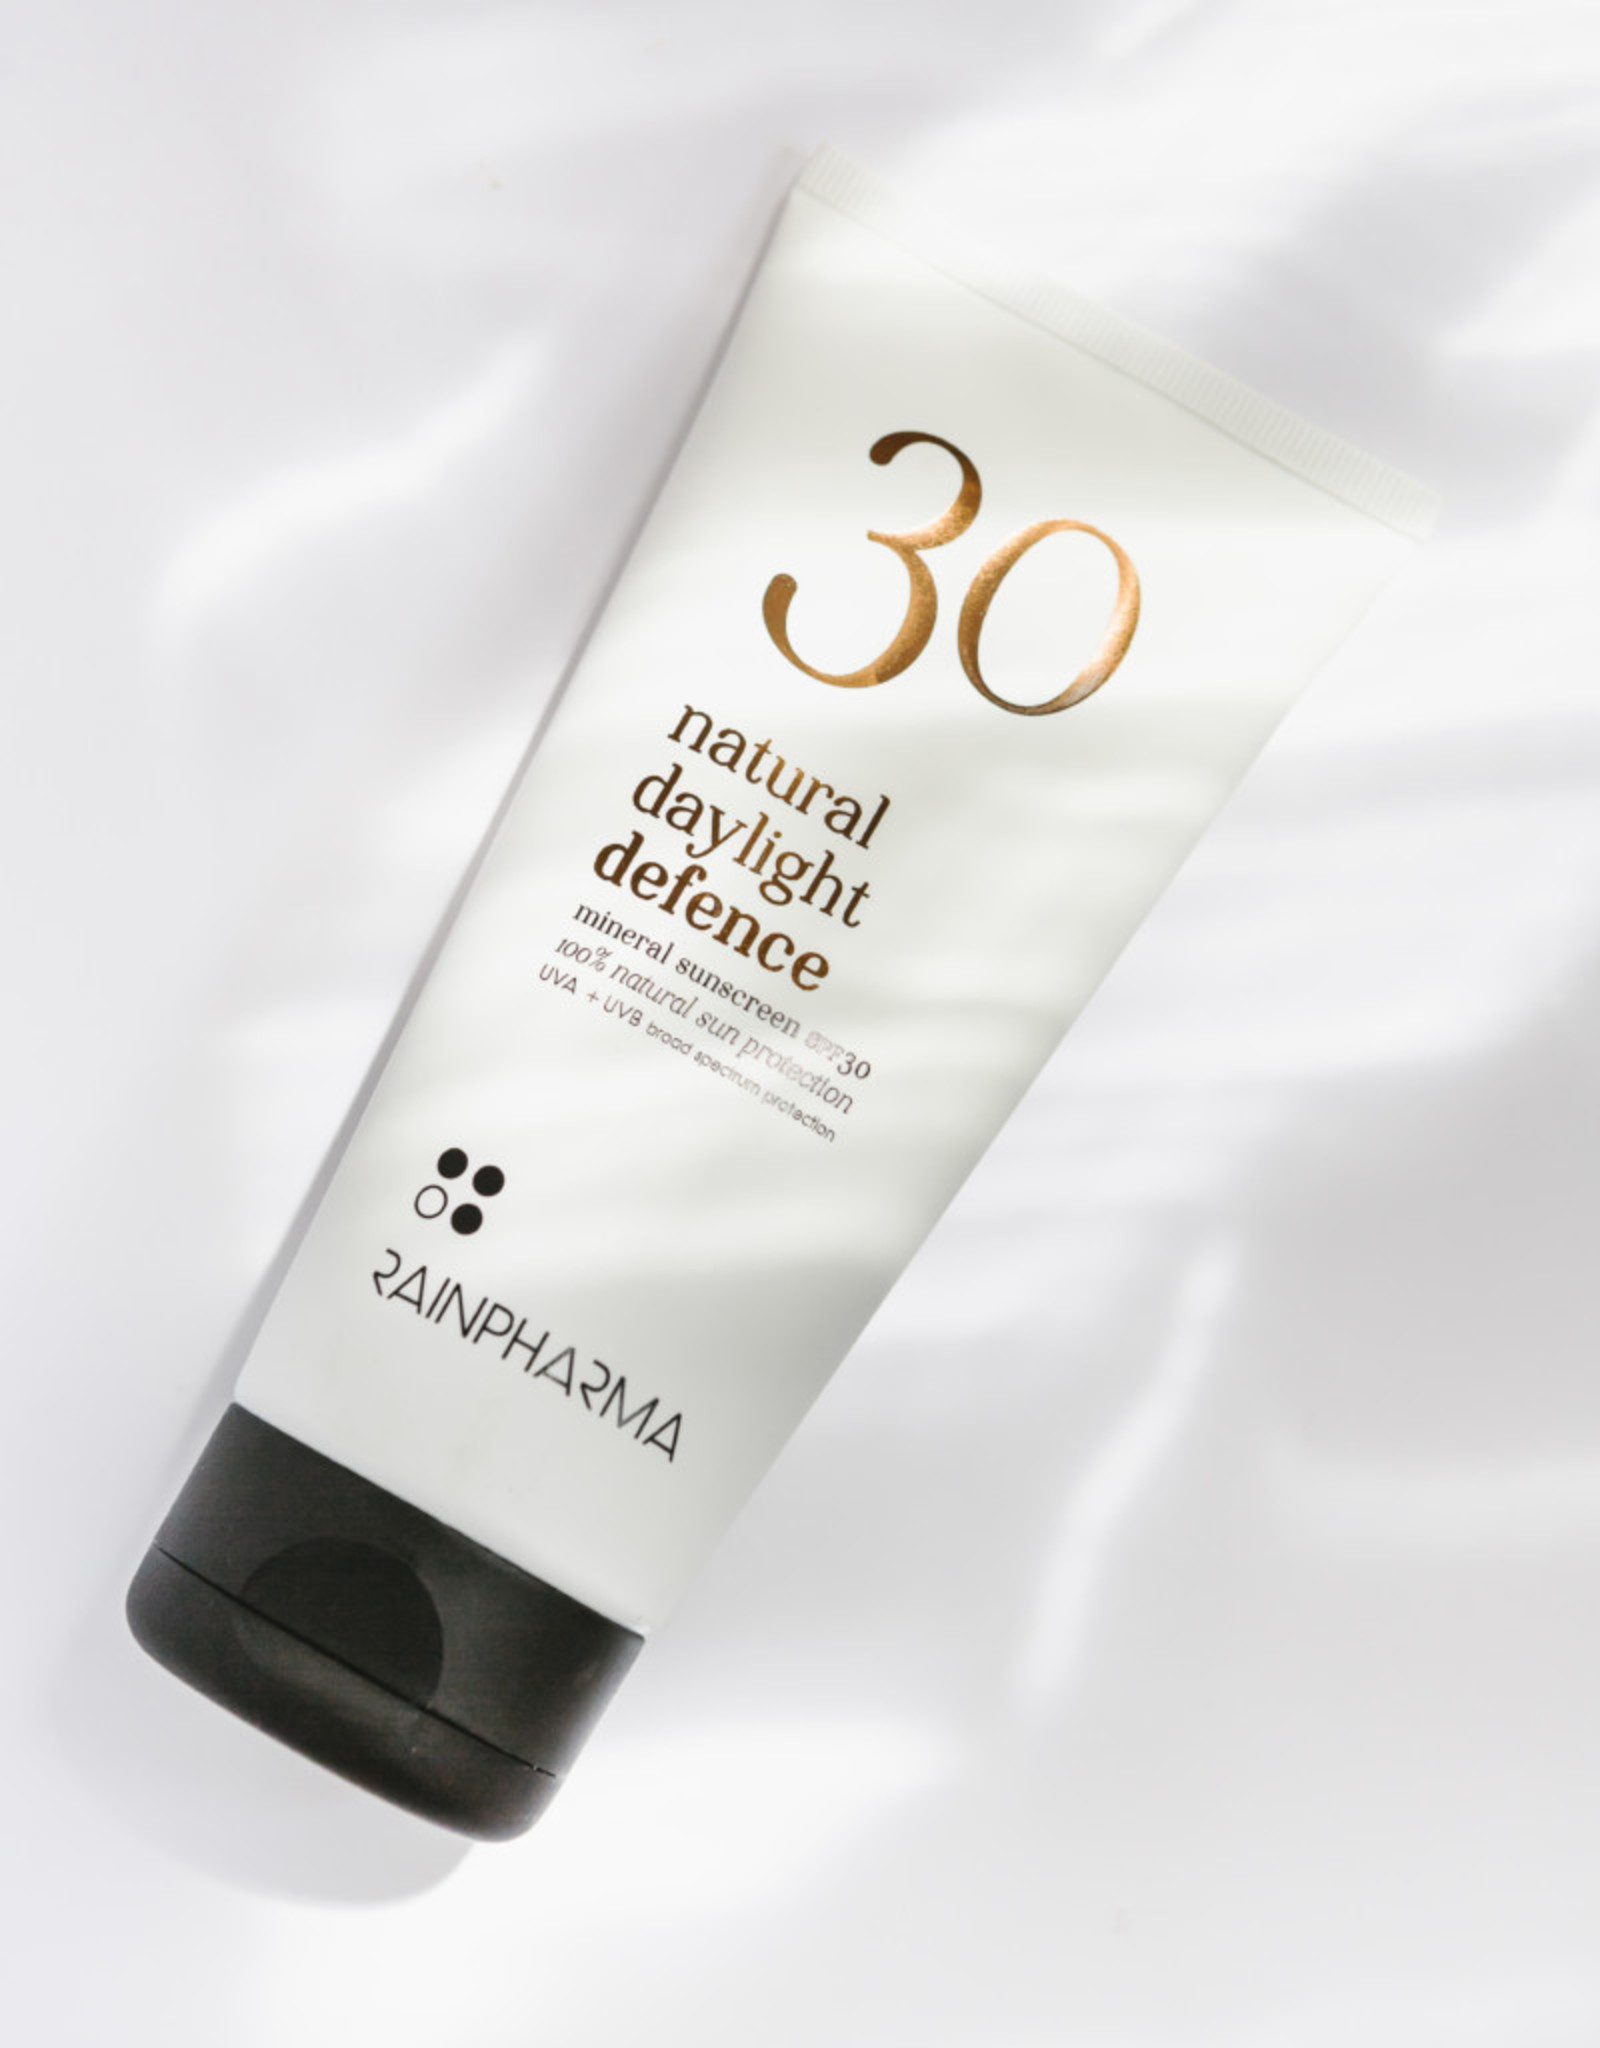 RainPharma Natural Daylight Defense 200ml - Rainpharma